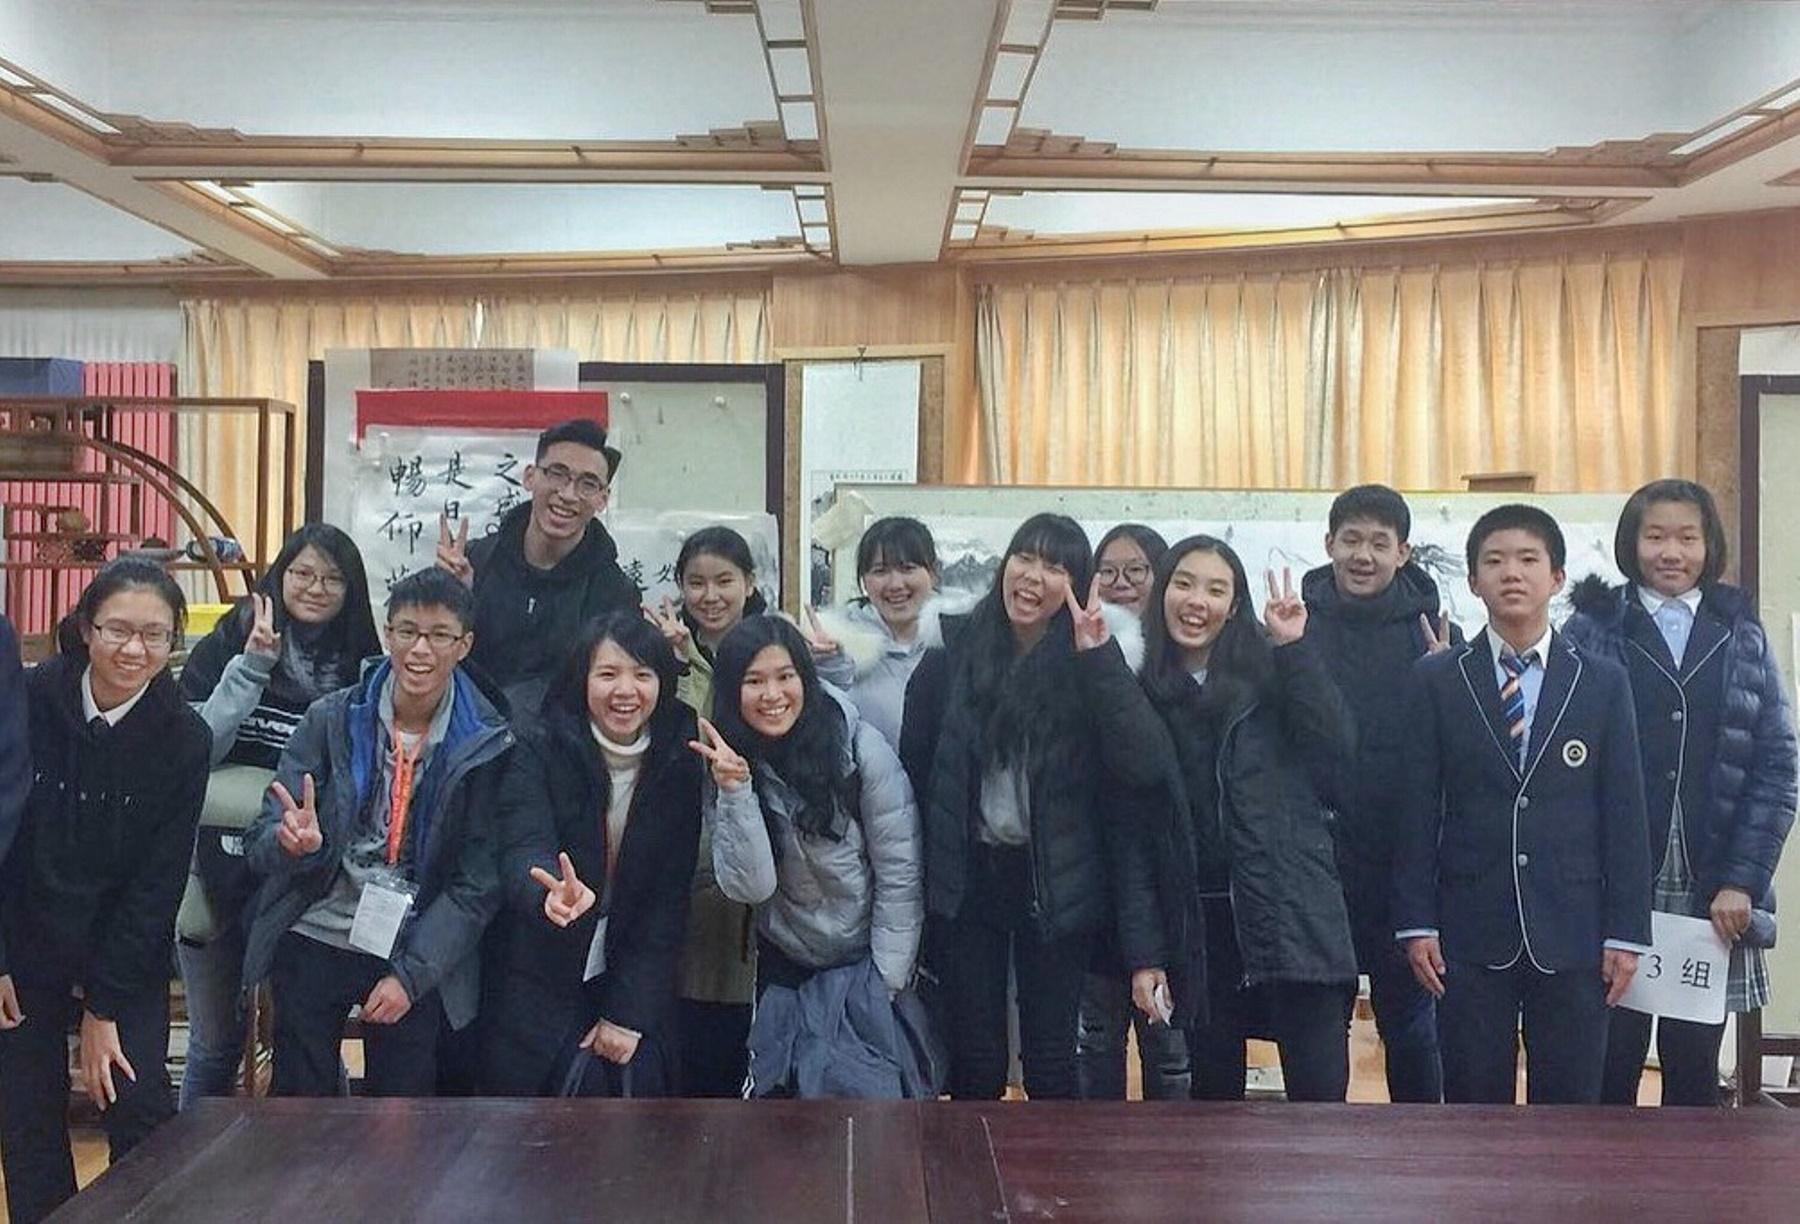 http://npc.edu.hk/sites/default/files/img_2629.jpg